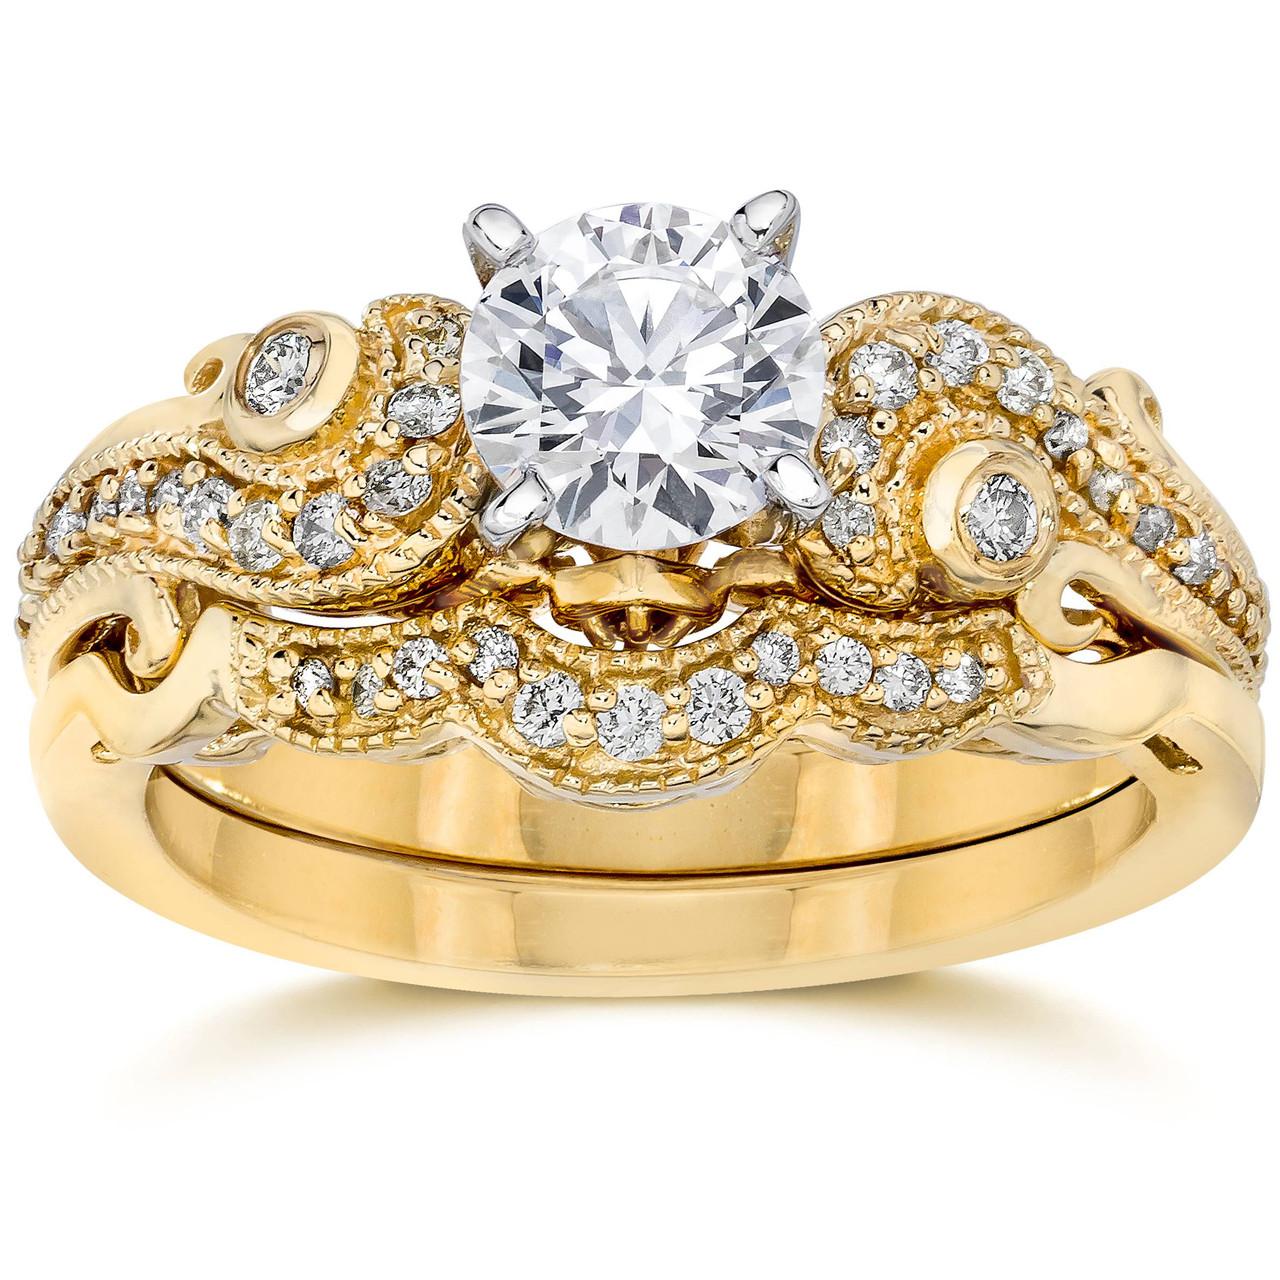 Emery 3 4ct Vintage Diamond Engagement Wedding Ring Set 14k Yellow Gold